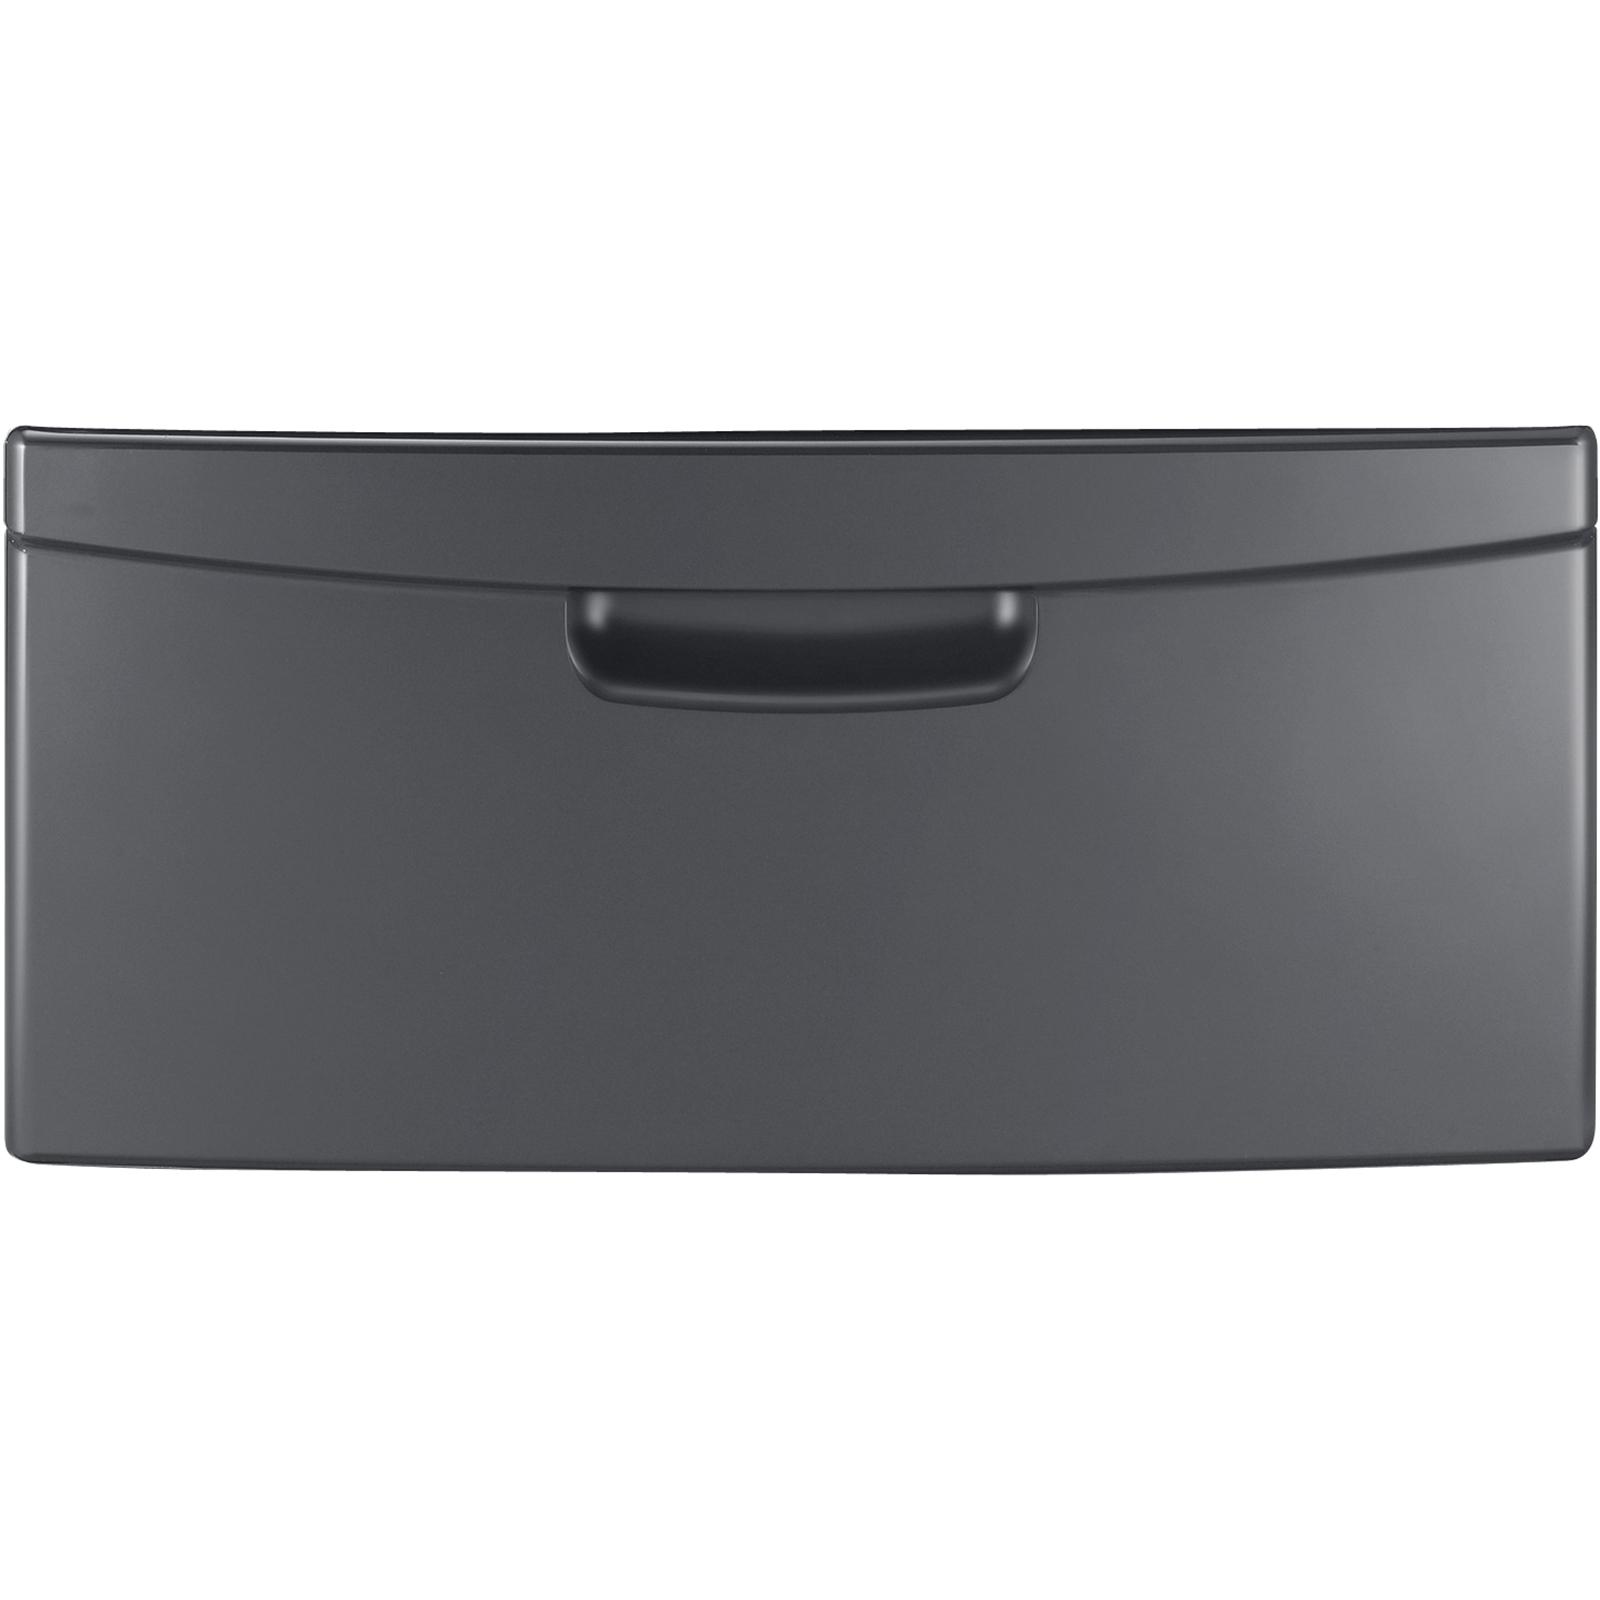 Samsung WE302NG 15 in. Pedestal - Onyx